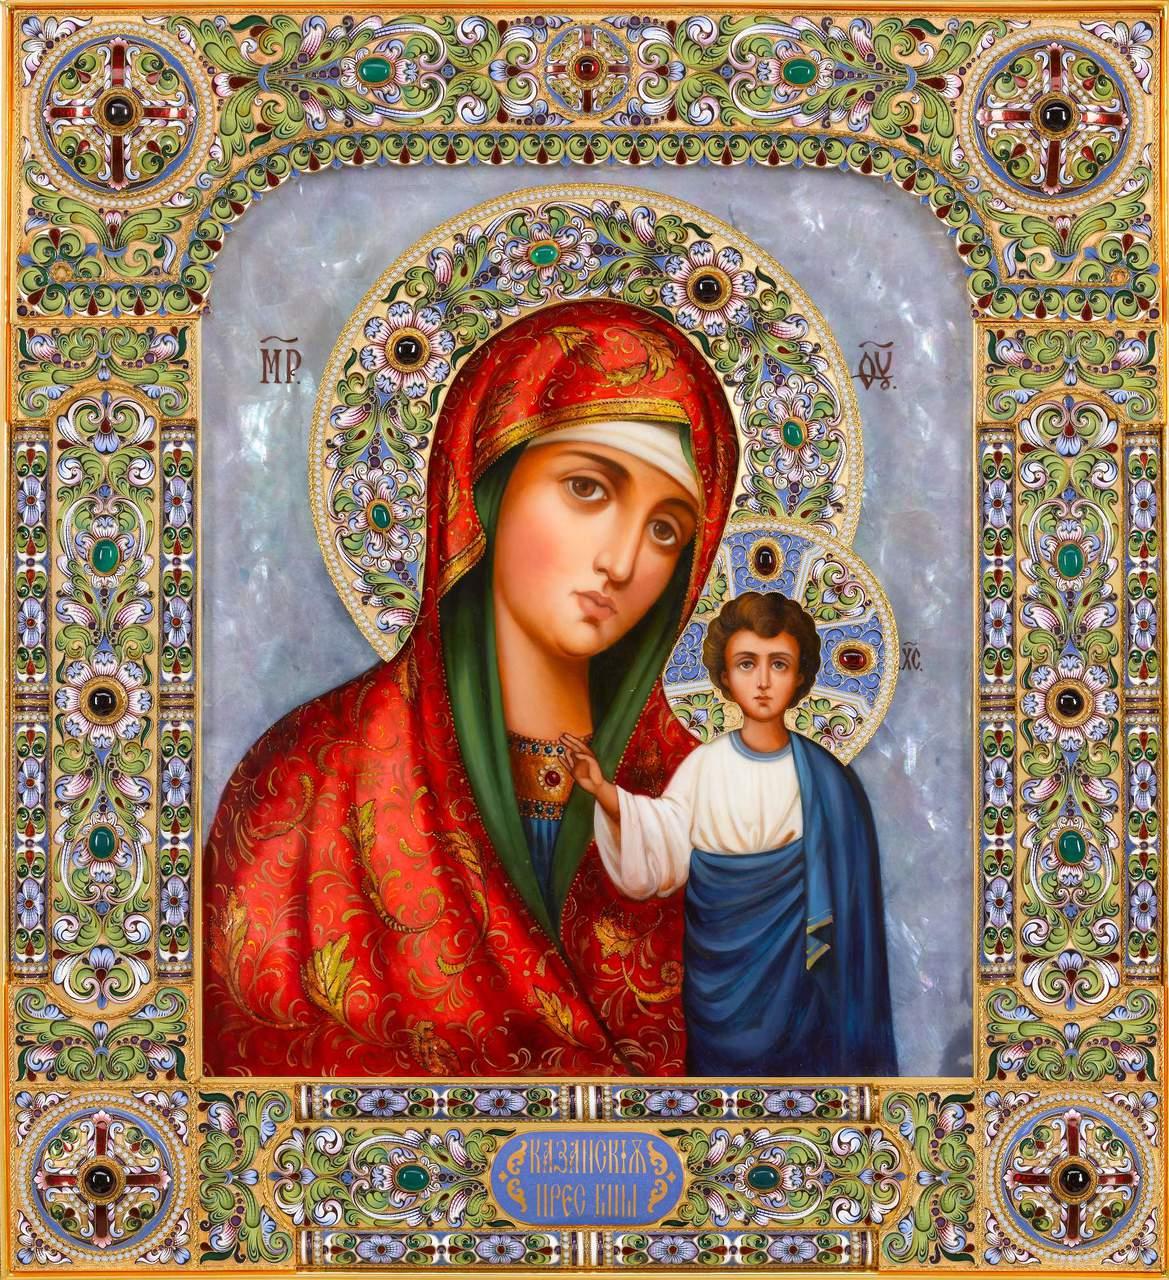 казанская икона божией матери: rpc-hram-stanica.cerkov.ru/nadezhda-moya-bogorodica